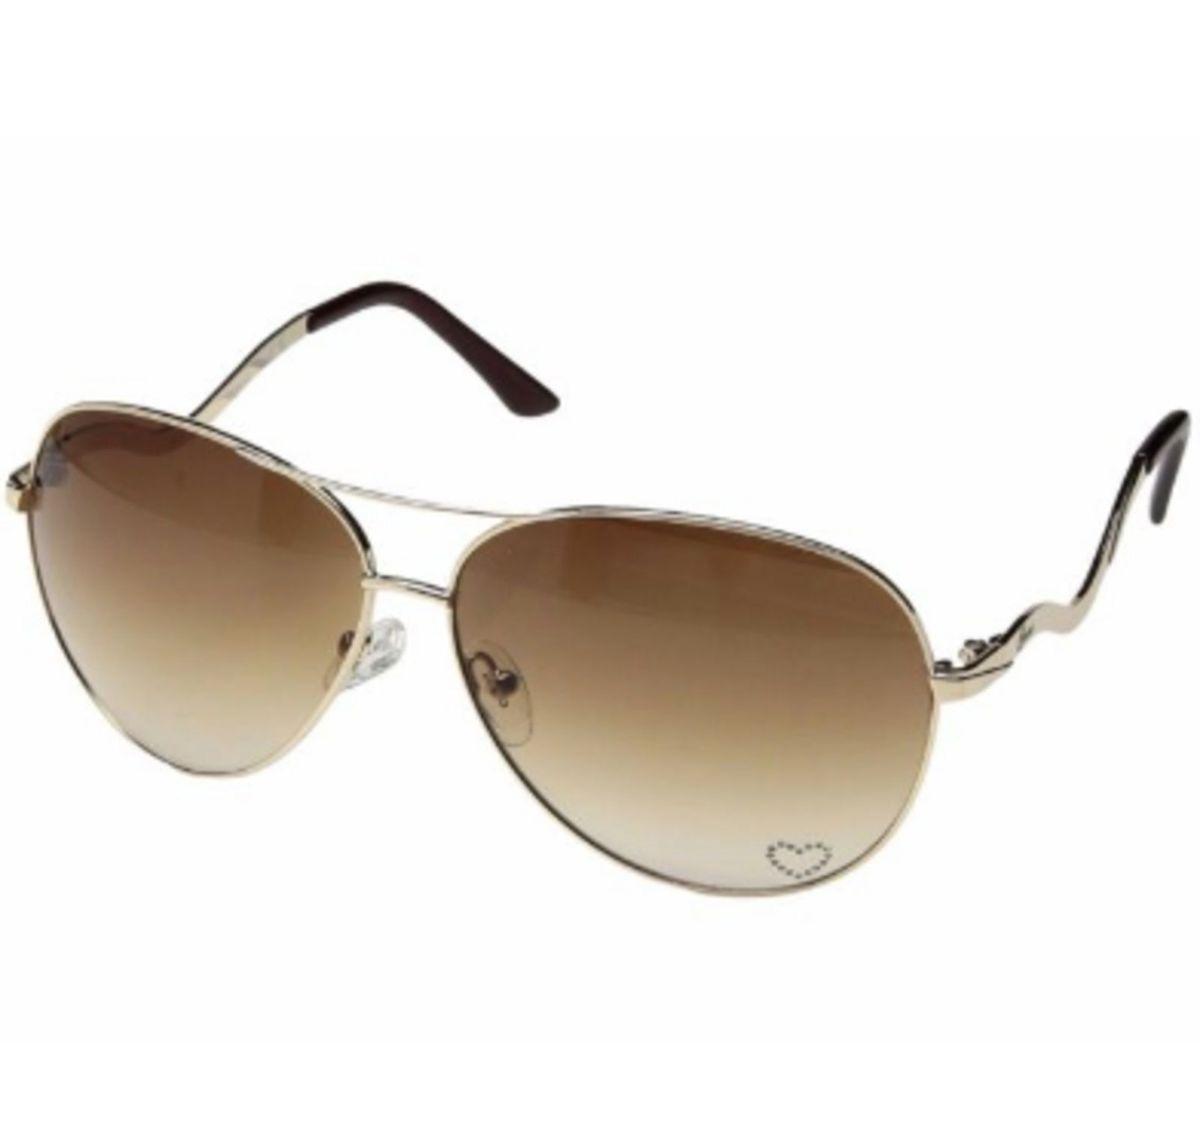 c9f5d3b44a73a oculos de sol guess aviador - óculos guess.  Czm6ly9wag90b3muzw5qb2vplmnvbs5ici9wcm9kdwn0cy8ymtmwos8zmtczmwrjzmuznjg4ztvhm2rmm2e1mzljymqymmm1zi5qcgc  ...